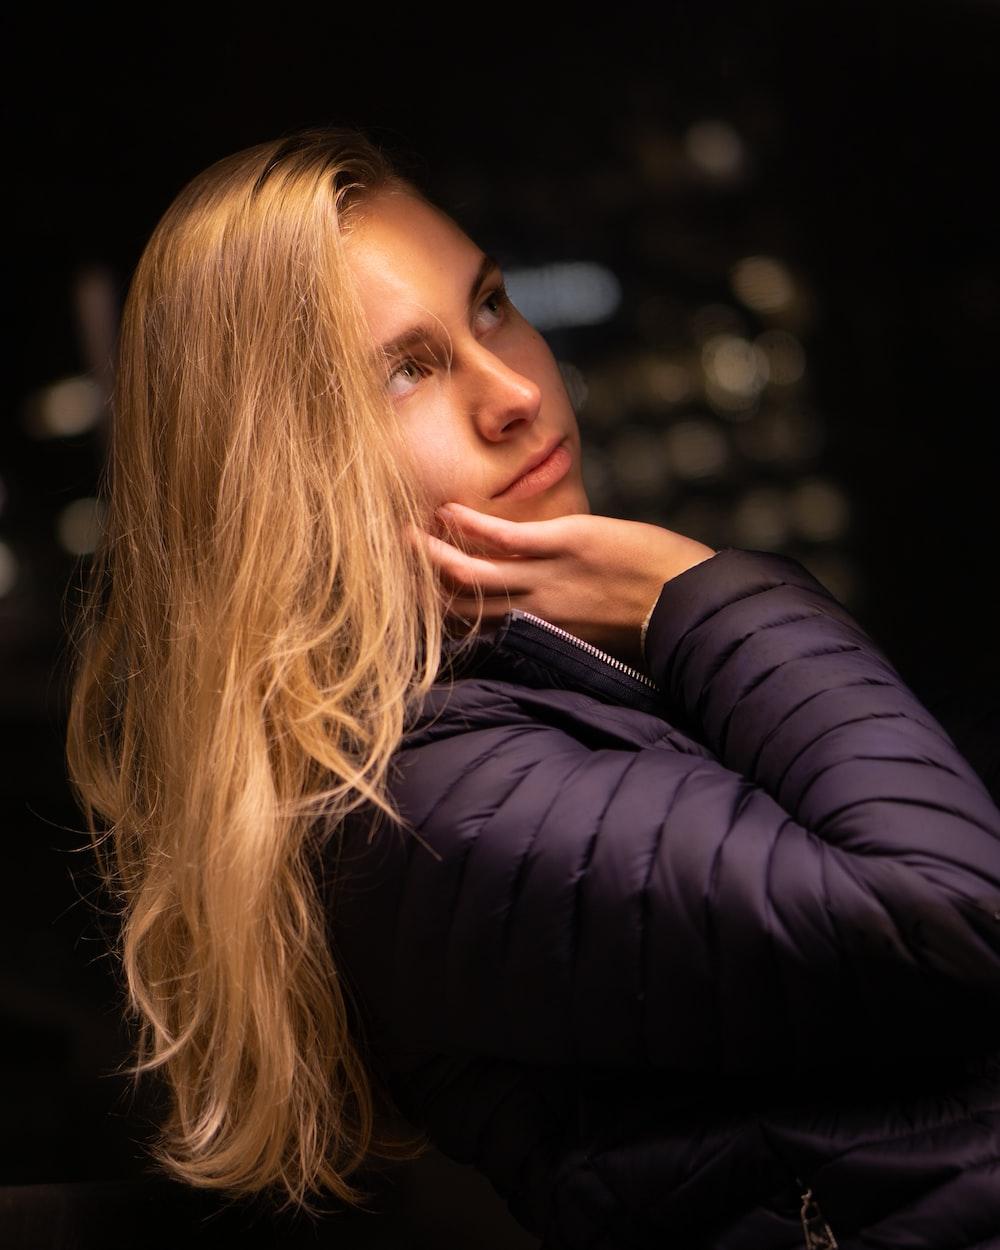 woman wearing black jacket